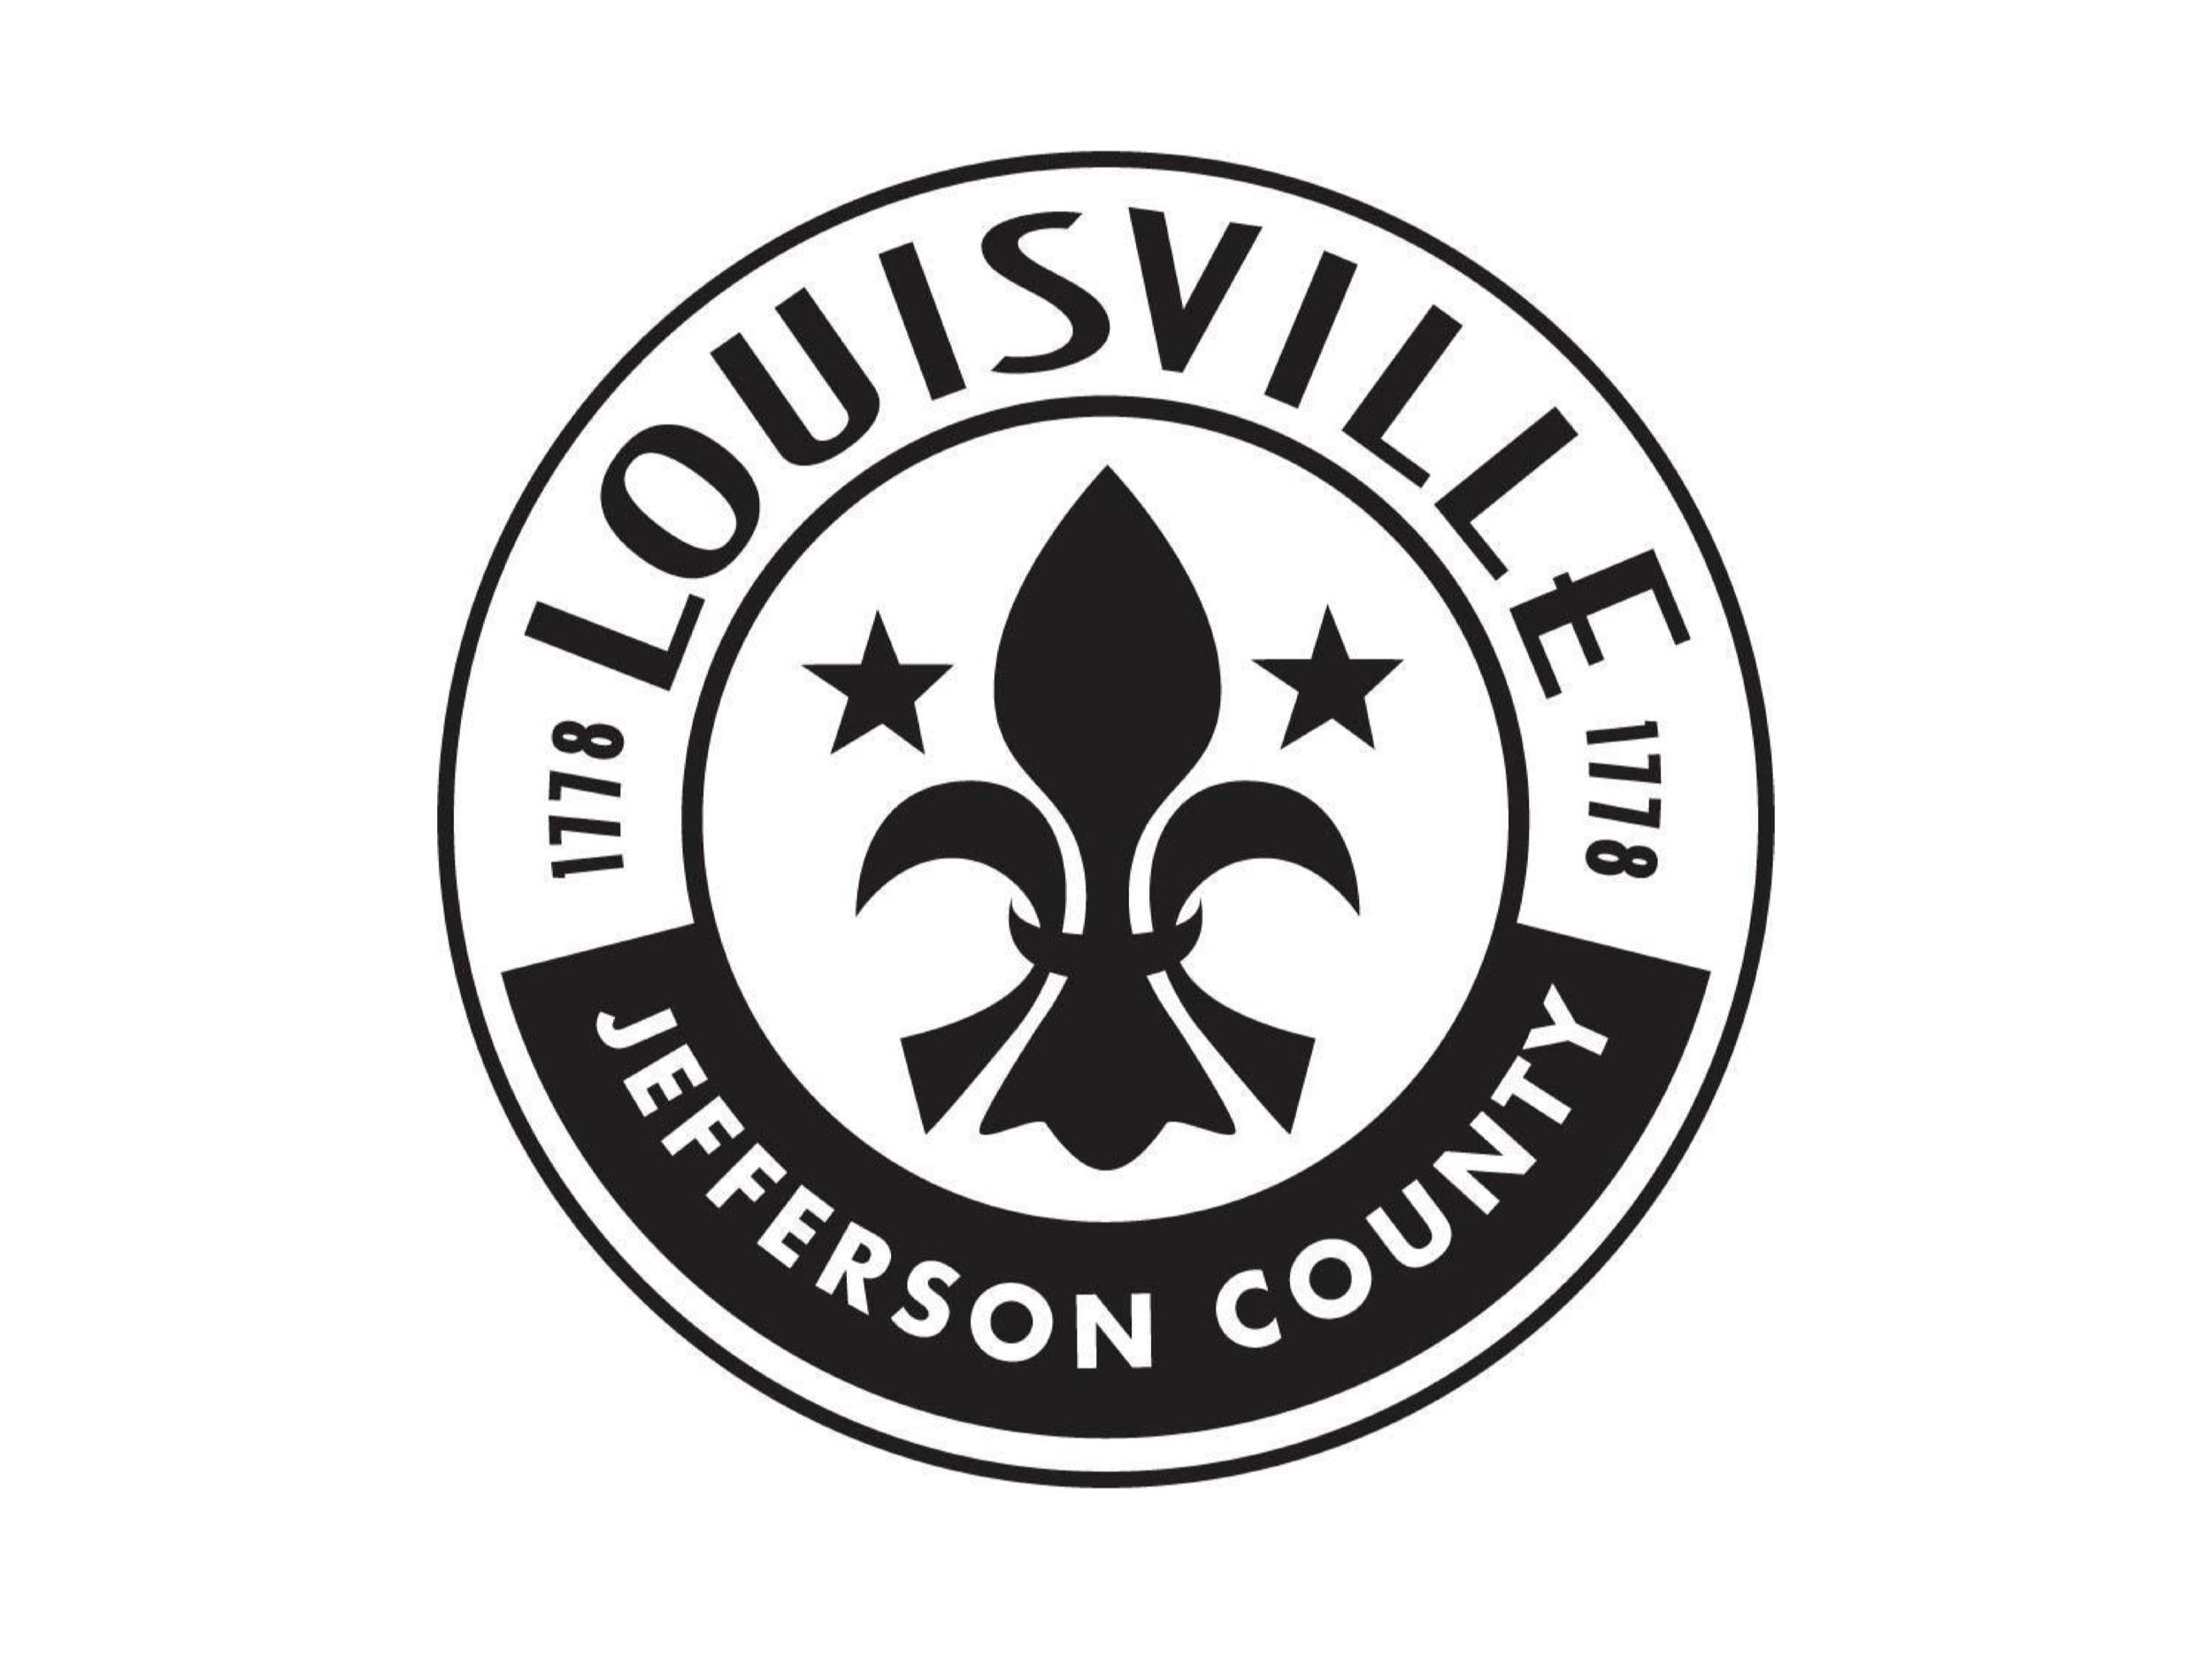 louisville+logo1.jpg